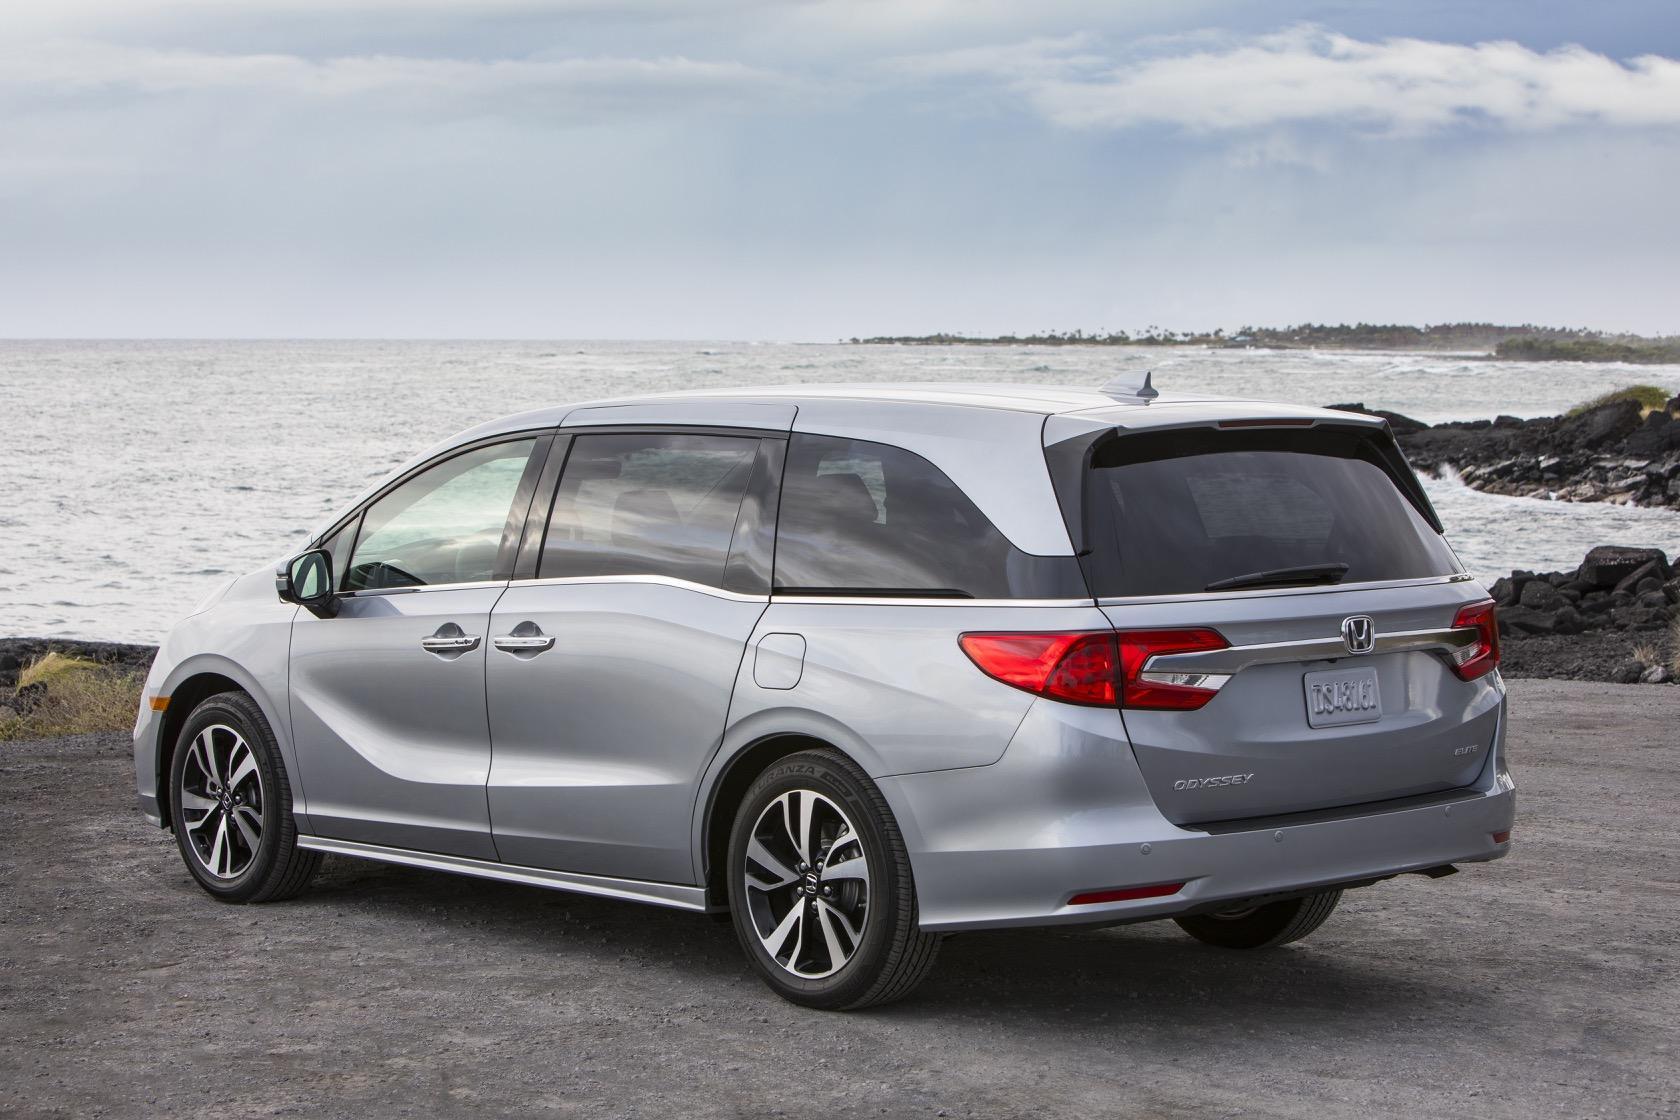 2019 Toyota Sienna Vs 2019 Honda Odyssey Minivan Comparison Slashgear